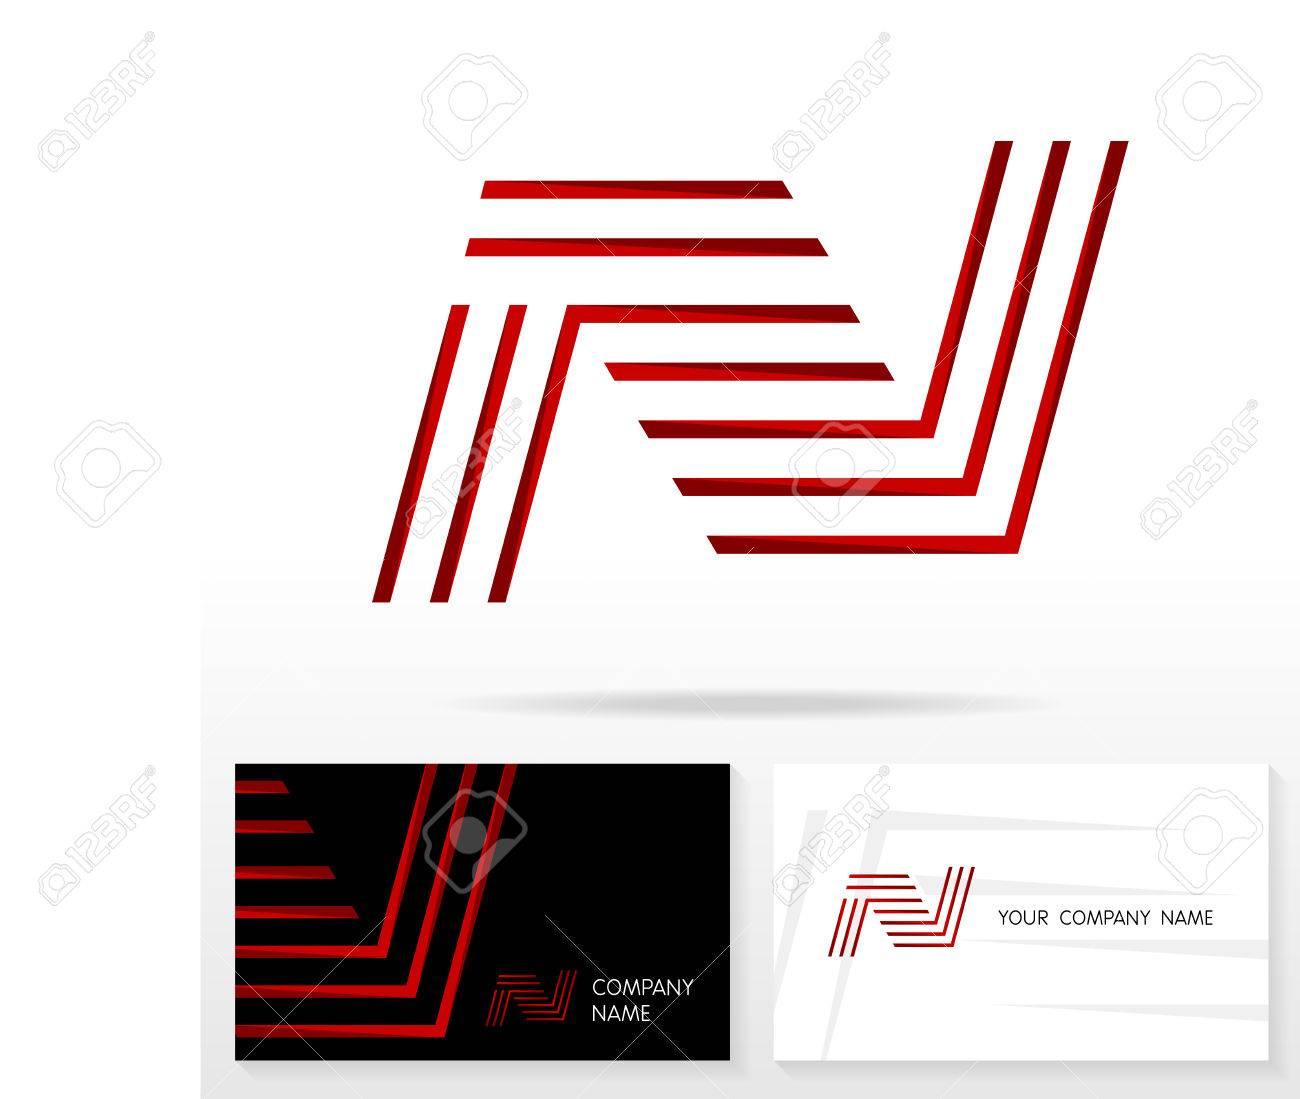 Letter n logo design vector sign stock vector business card letter n logo design vector sign stock vector business card templates stock vector spiritdancerdesigns Choice Image